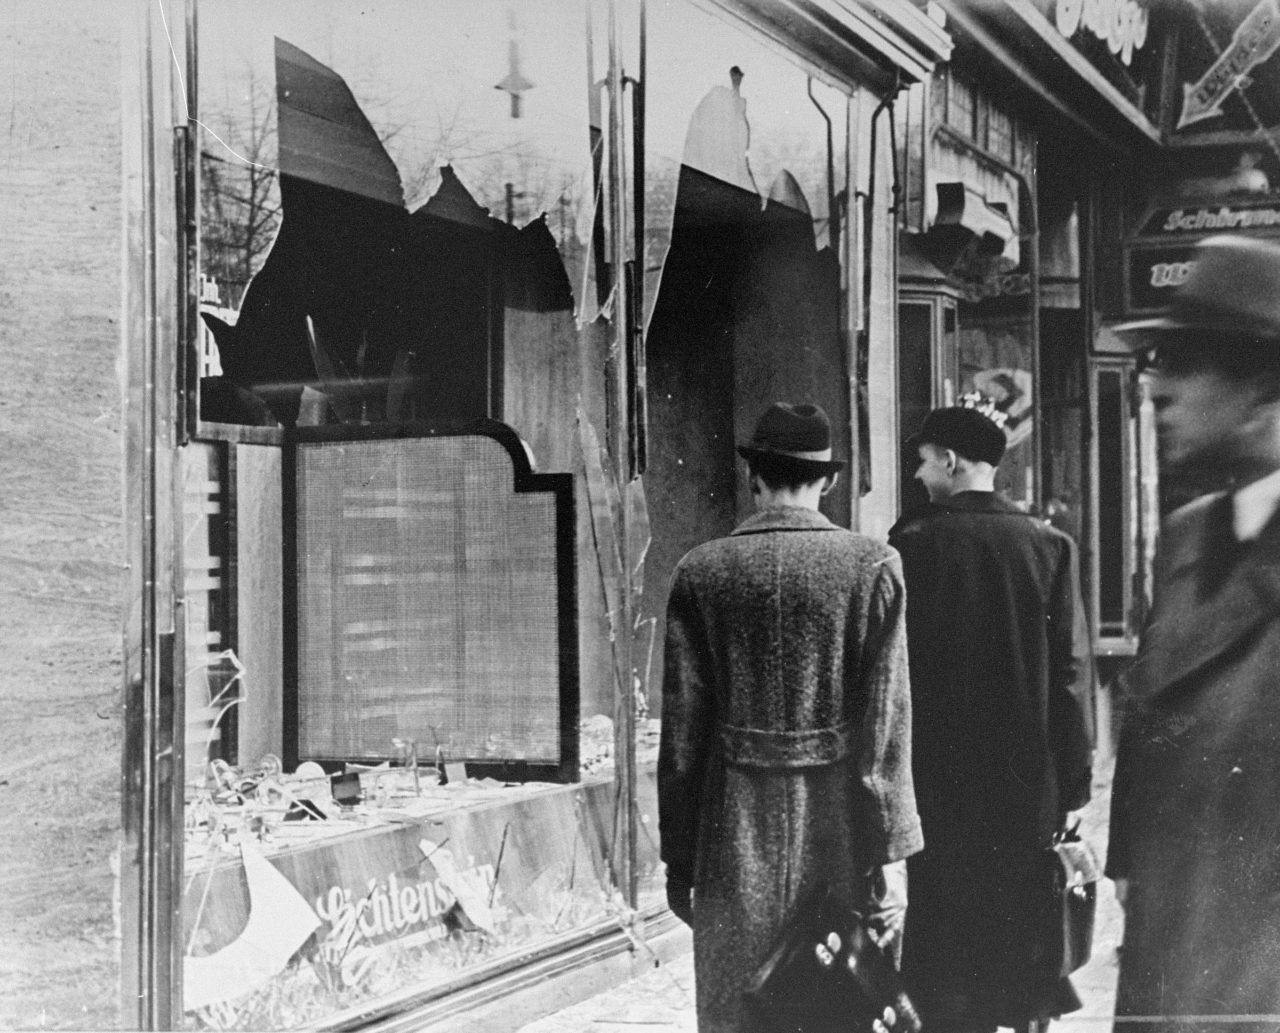 9 November 1938: Kristallnacht